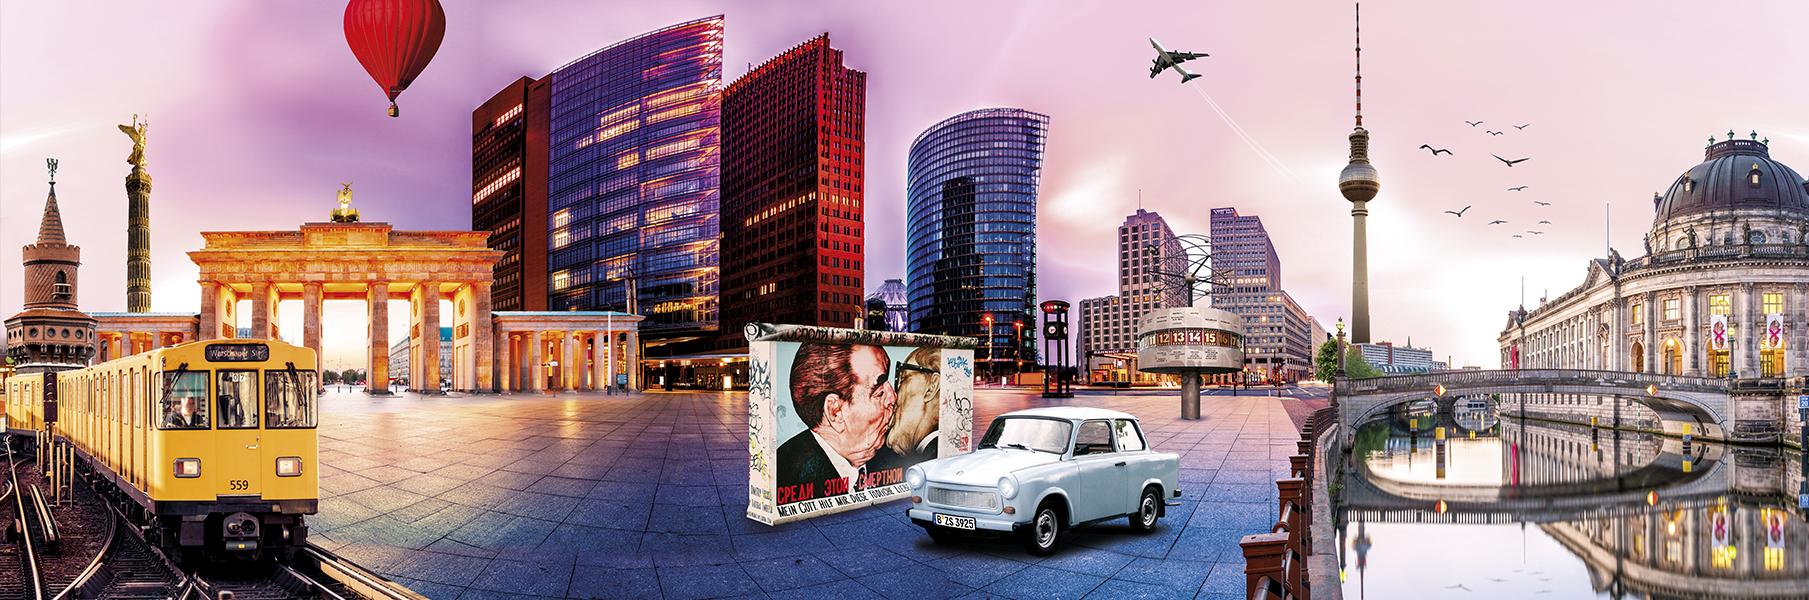 Berlin Bild Composion